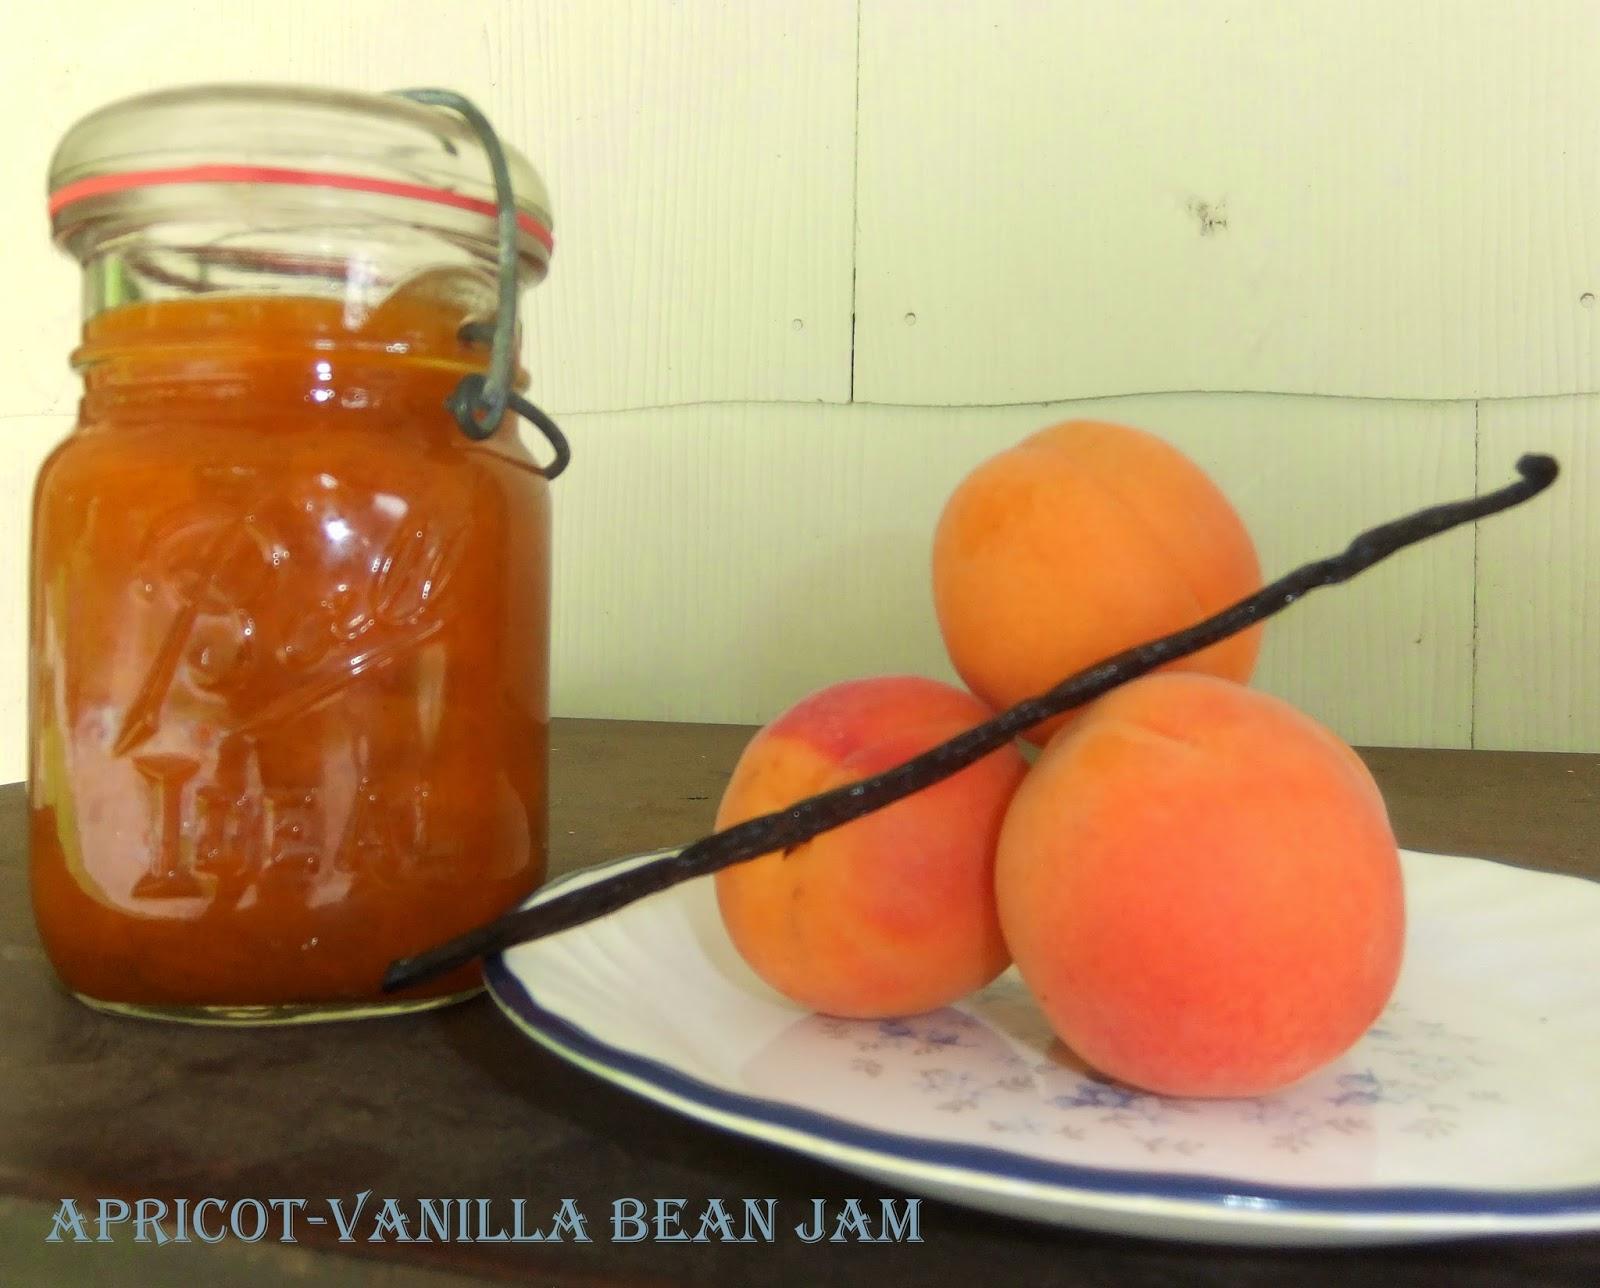 Apricot-Vanilla Bean Jam